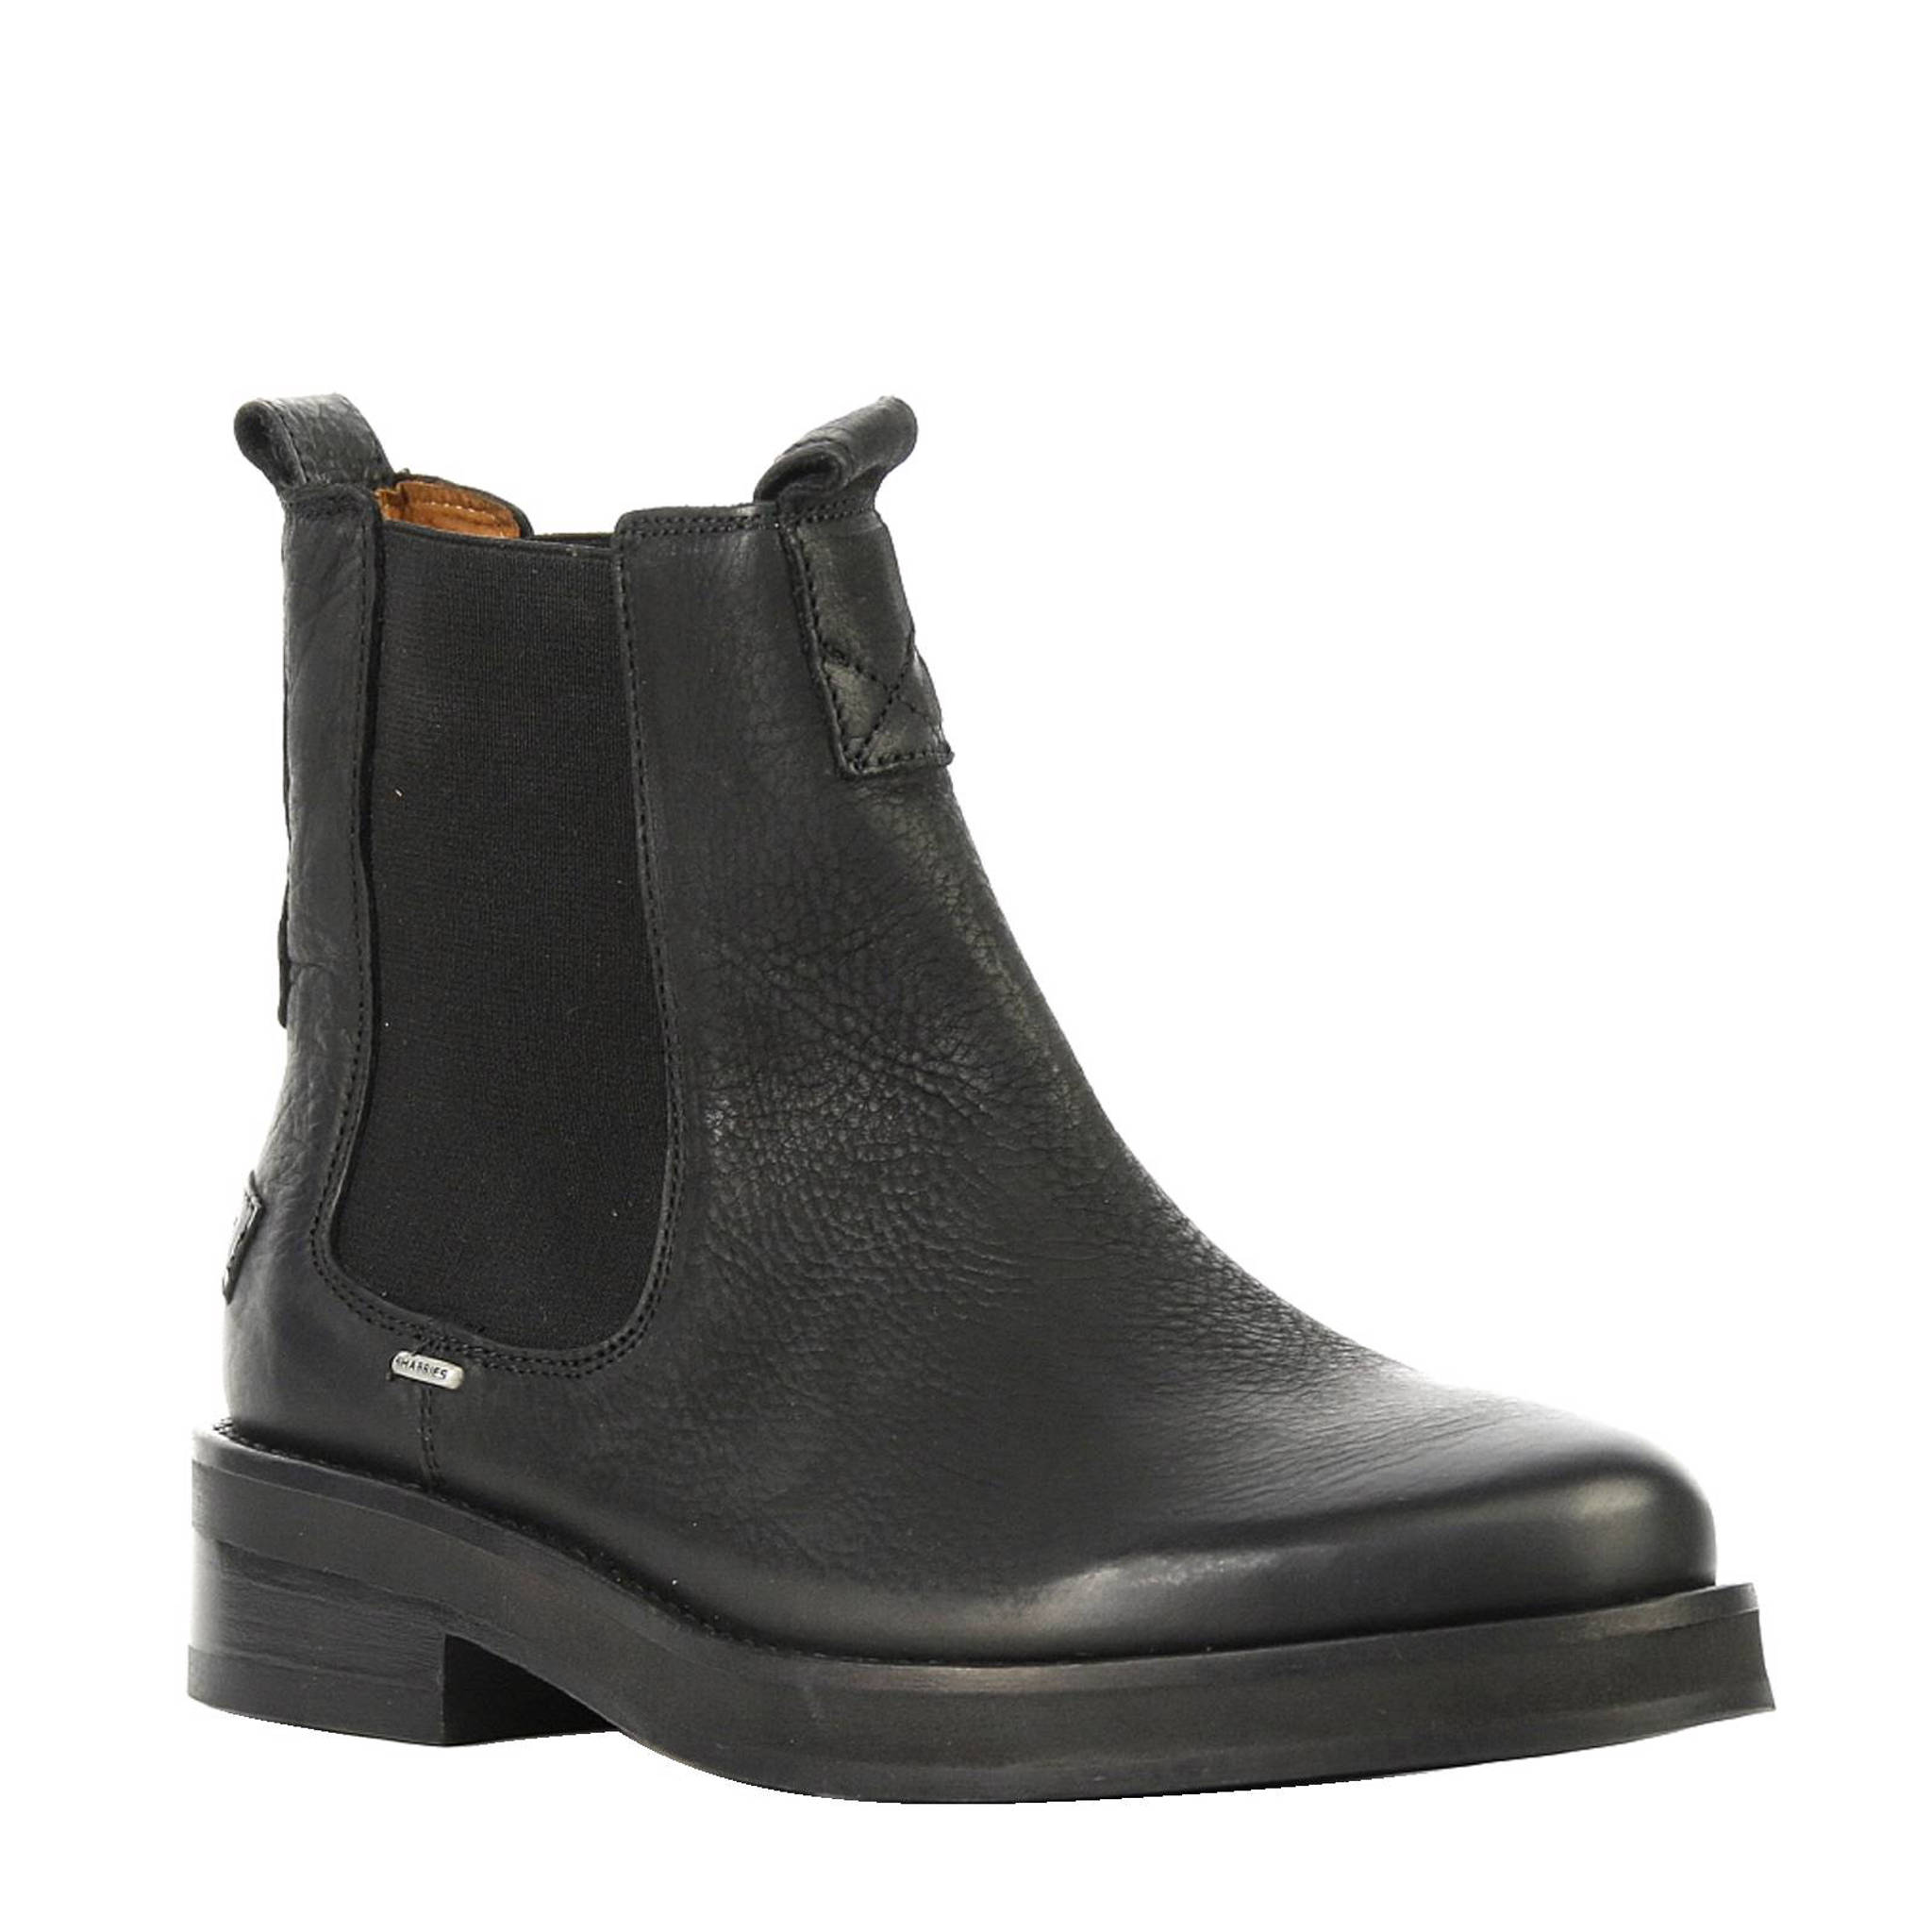 8b9a58234b2 Shabbies Amsterdam chelsea boots | wehkamp